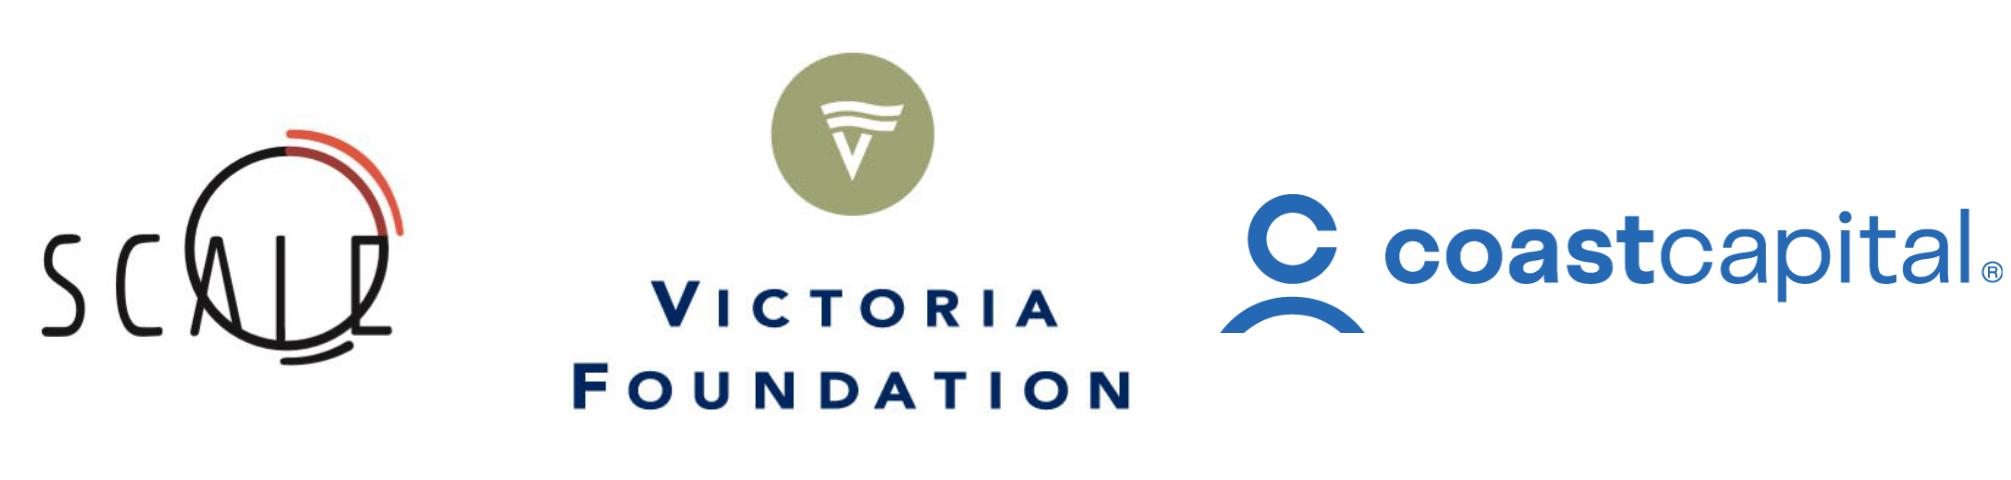 Scale Collaborative, Victoria Foundation and Coast Capital Logos